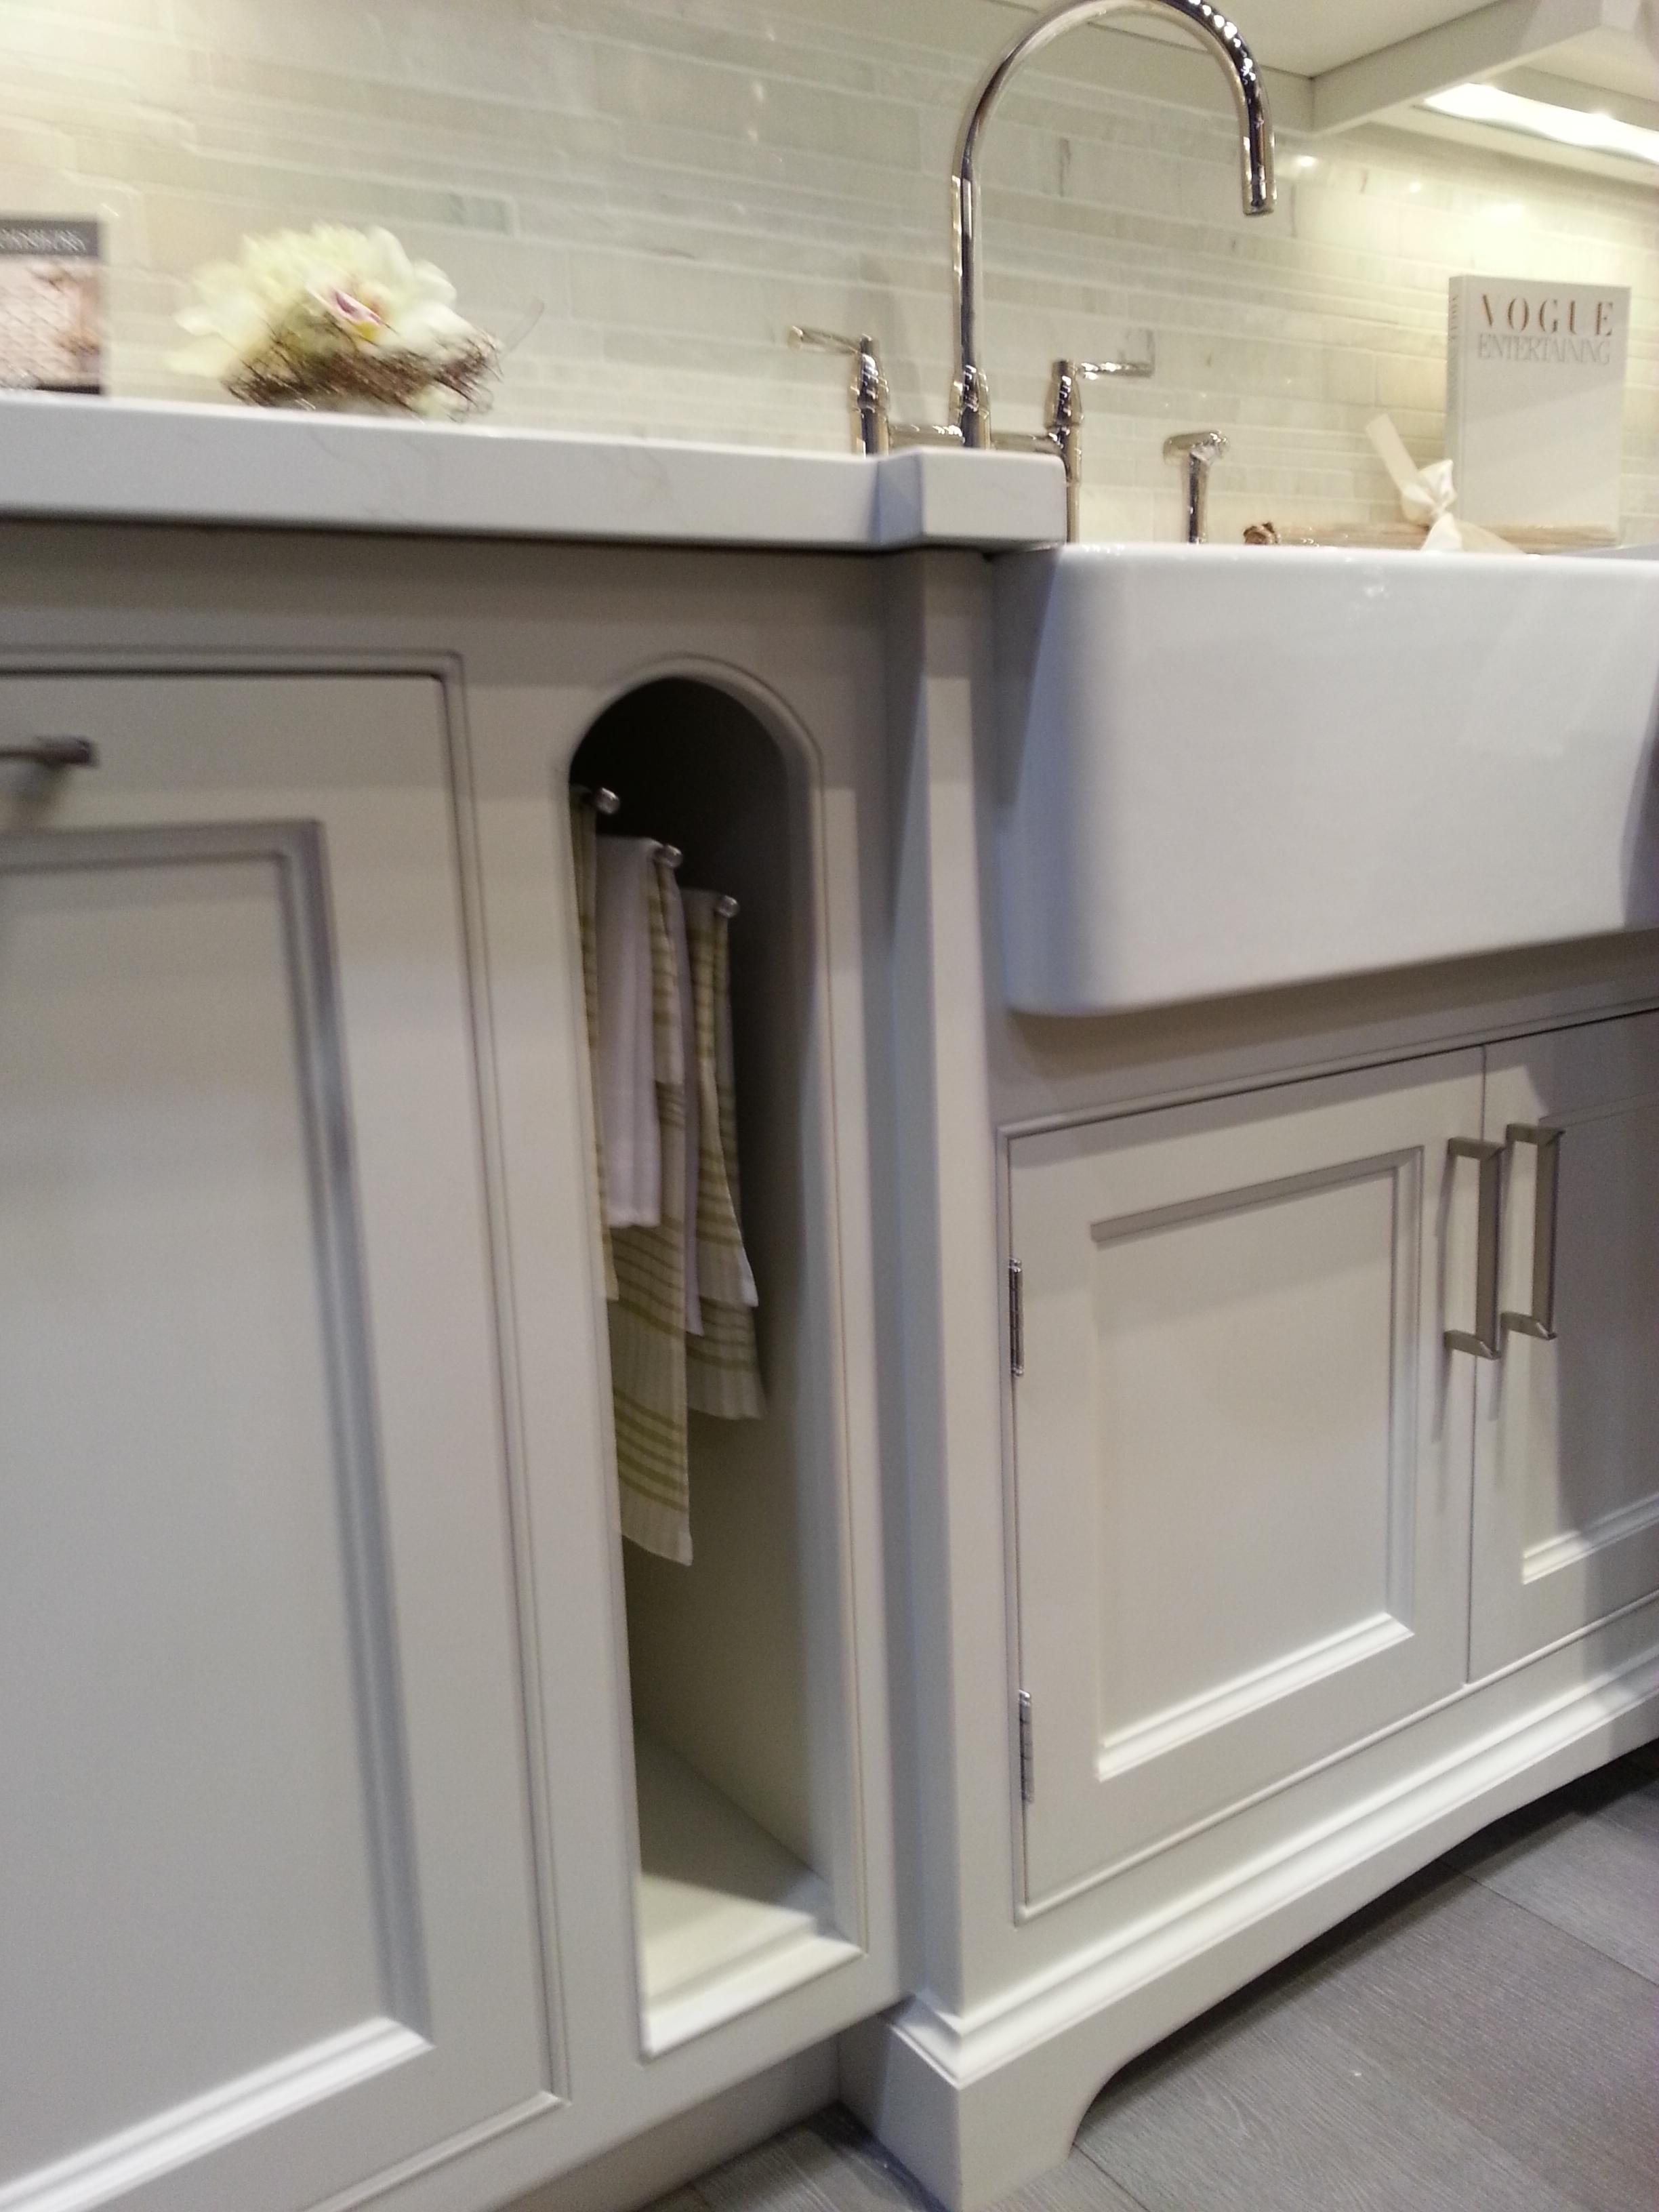 black kitchen countertops breakfast nook barnboard floors | my mid-life reno